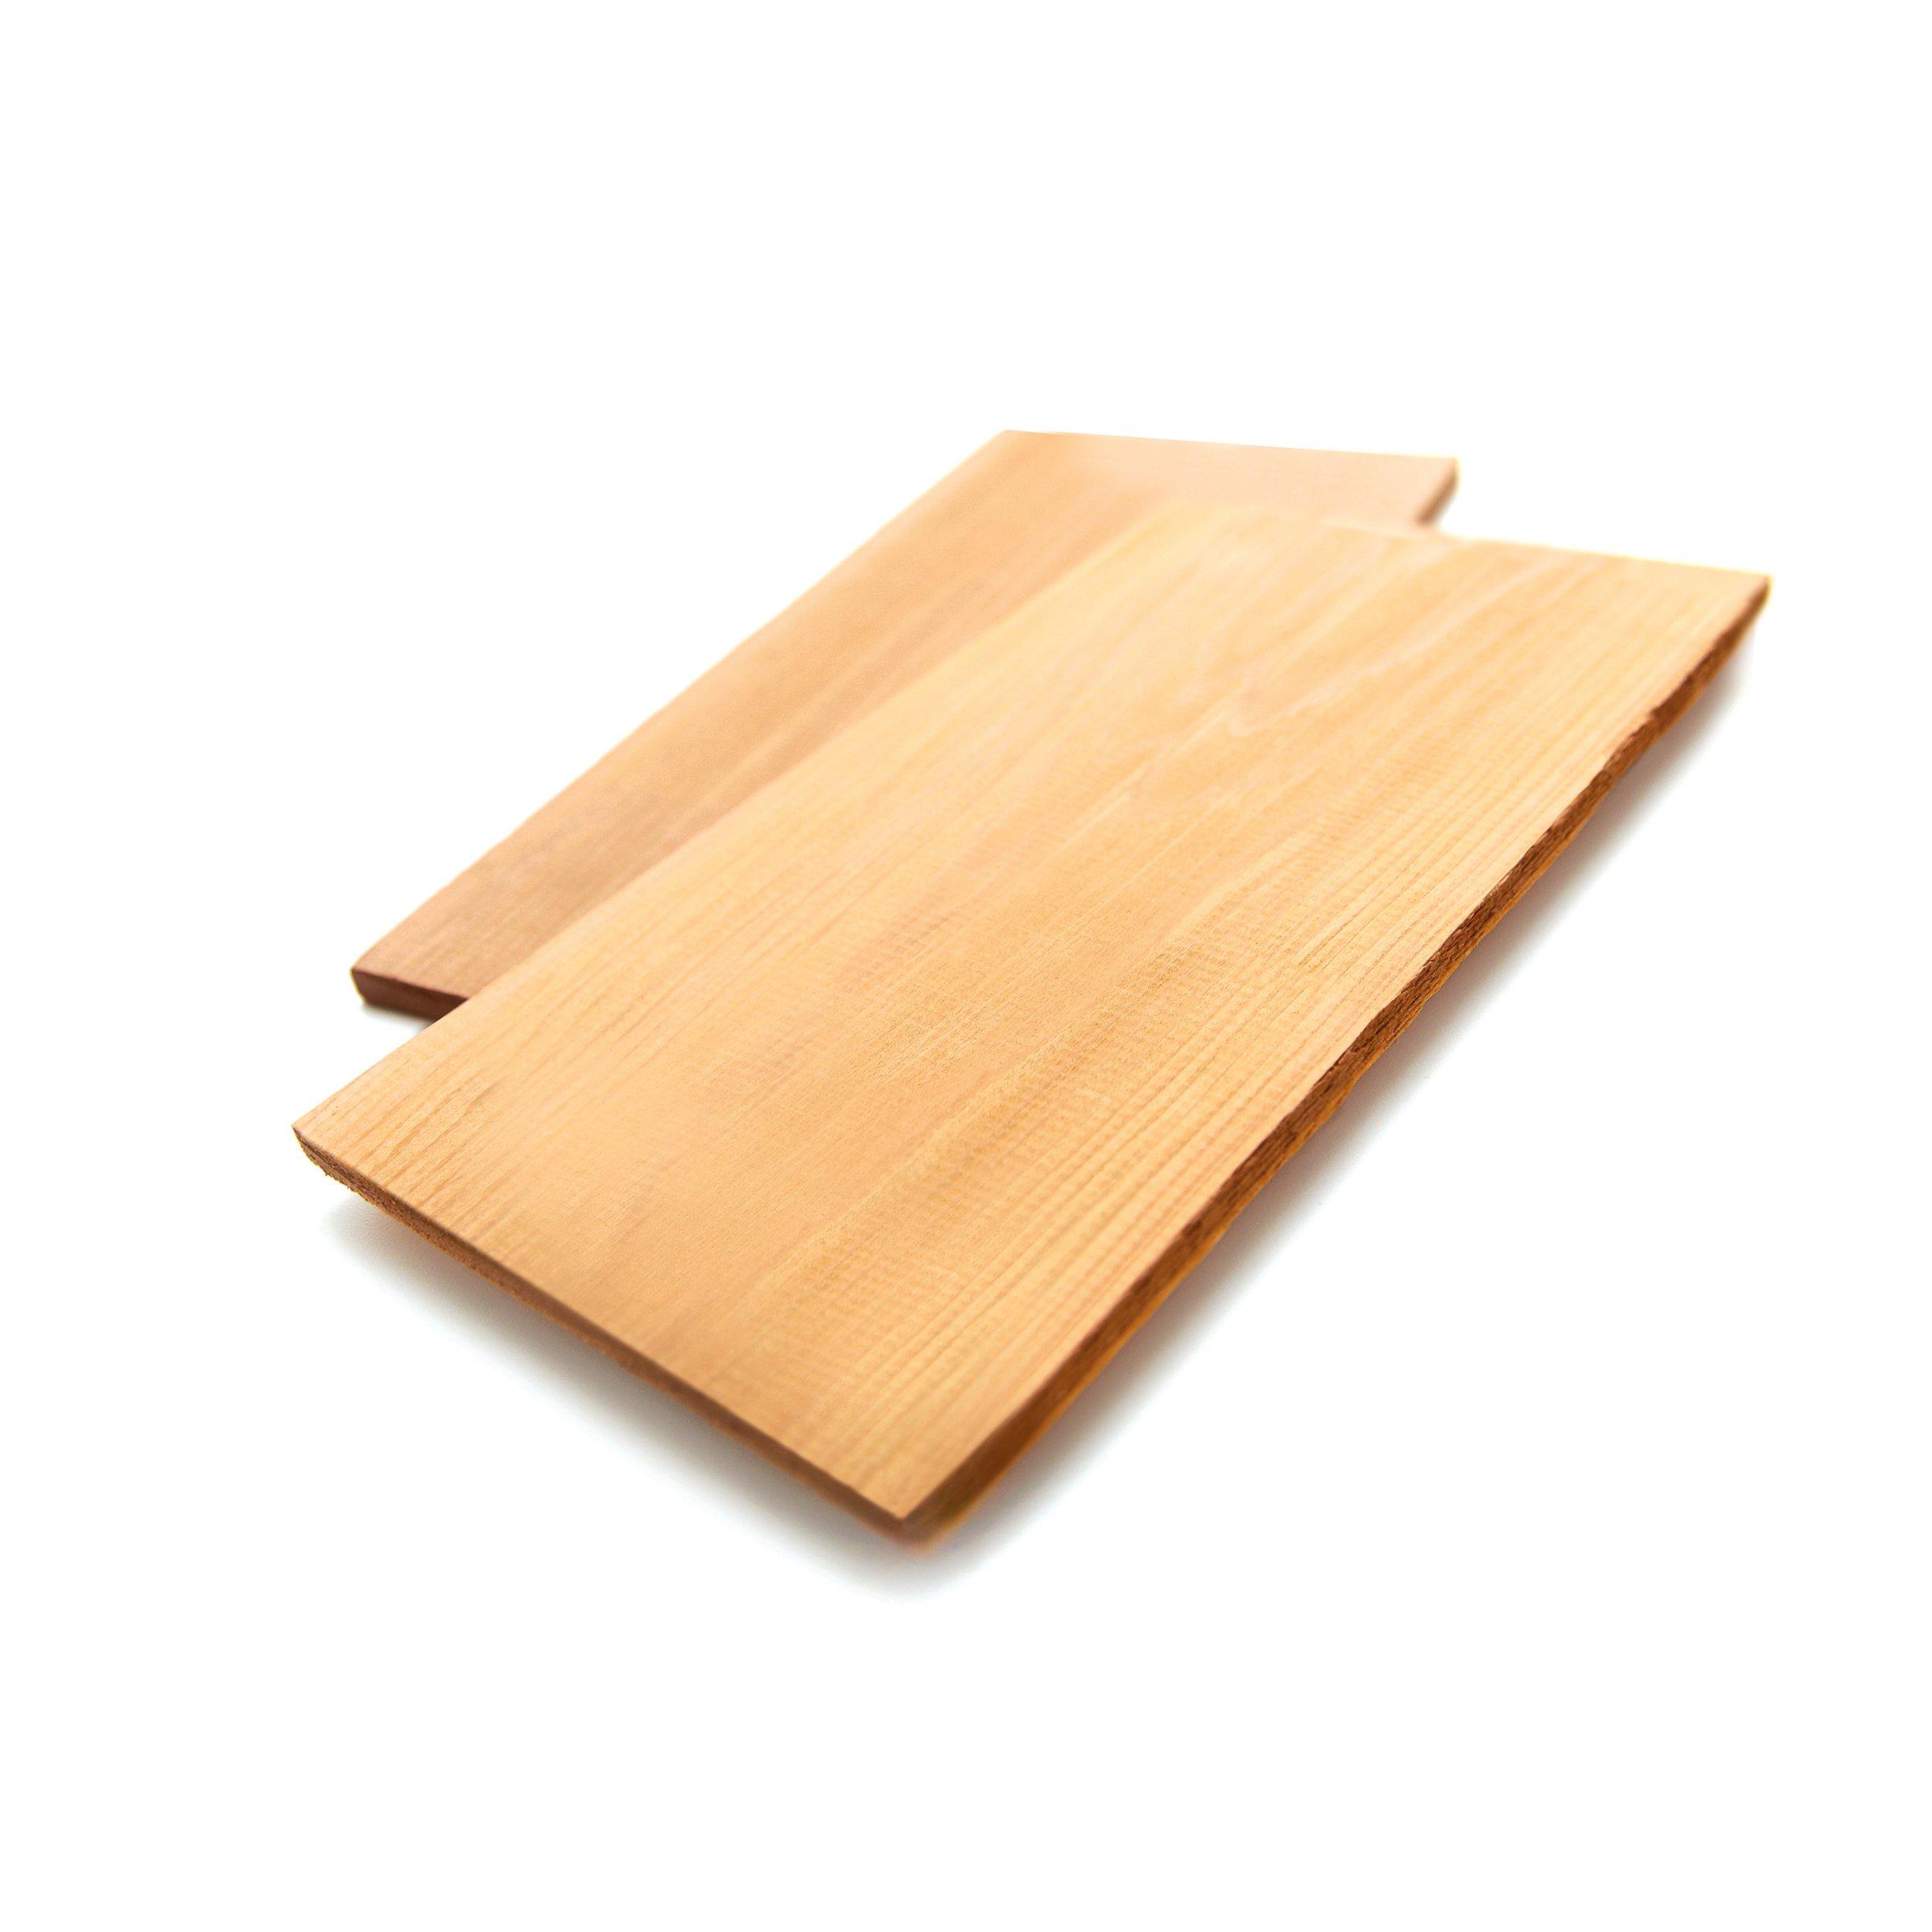 GrillPro Cedar Grilling Planks - 2-Pack